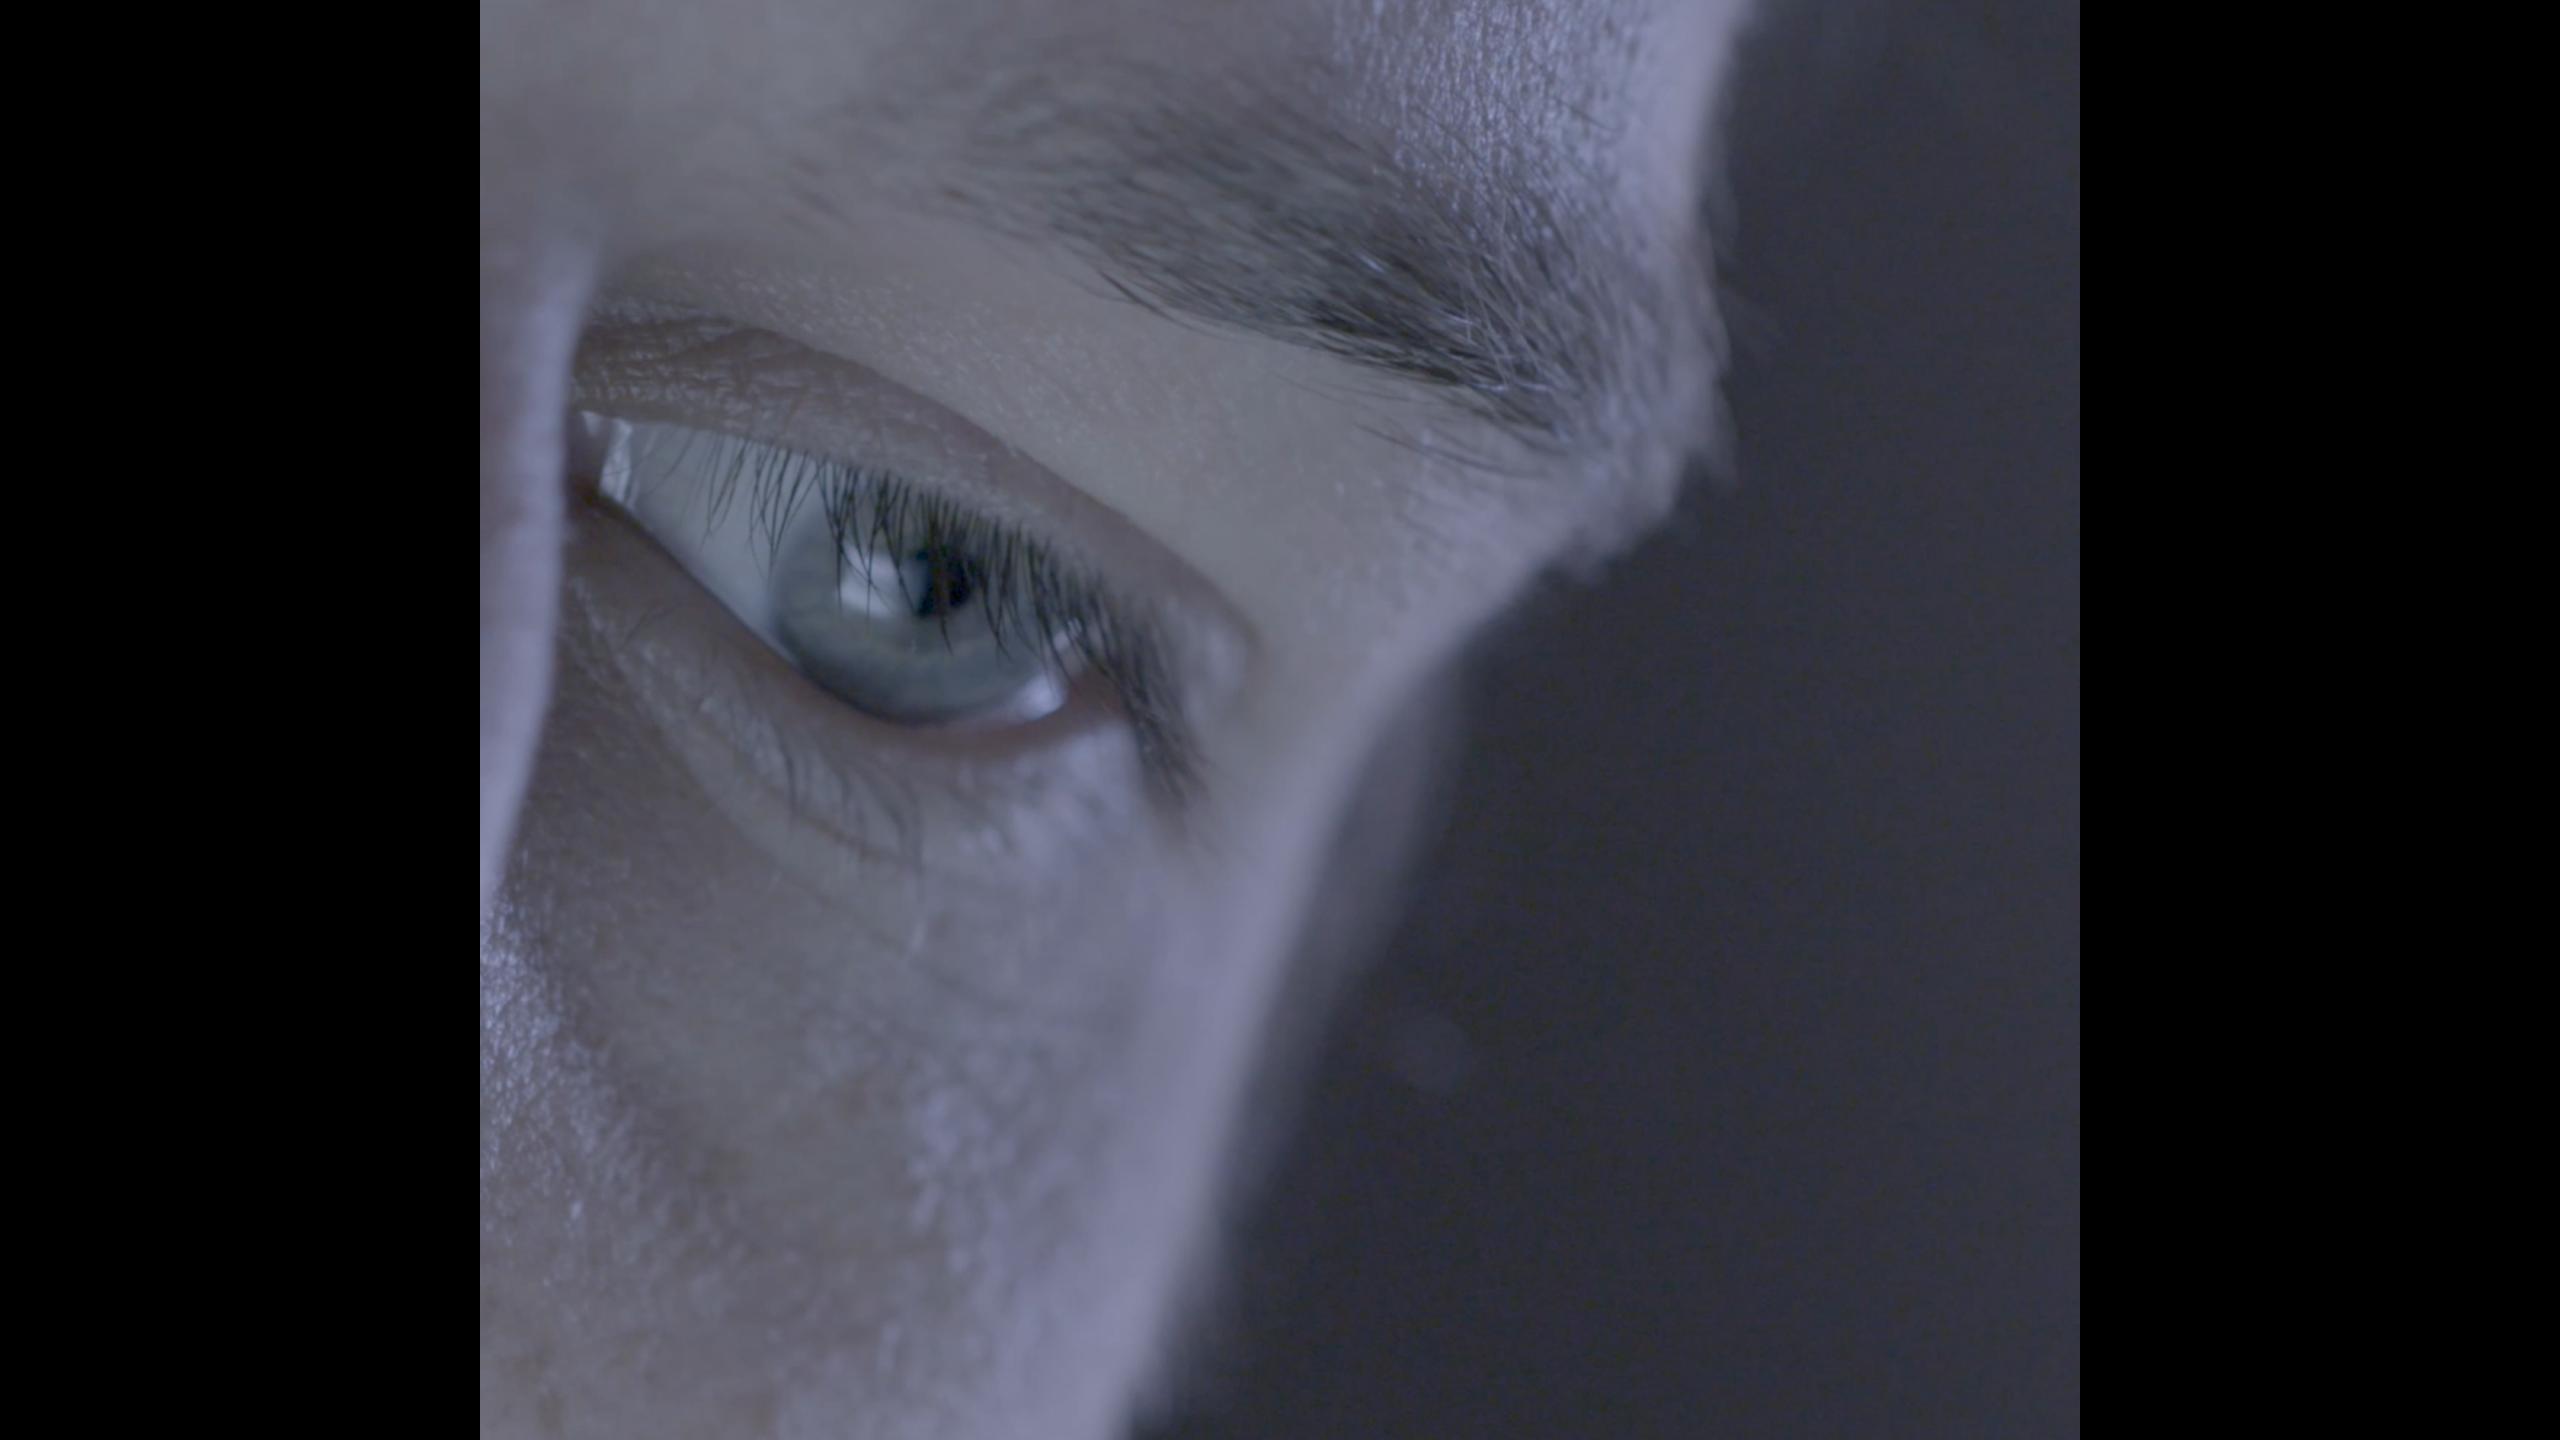 SCRT - close up of eye